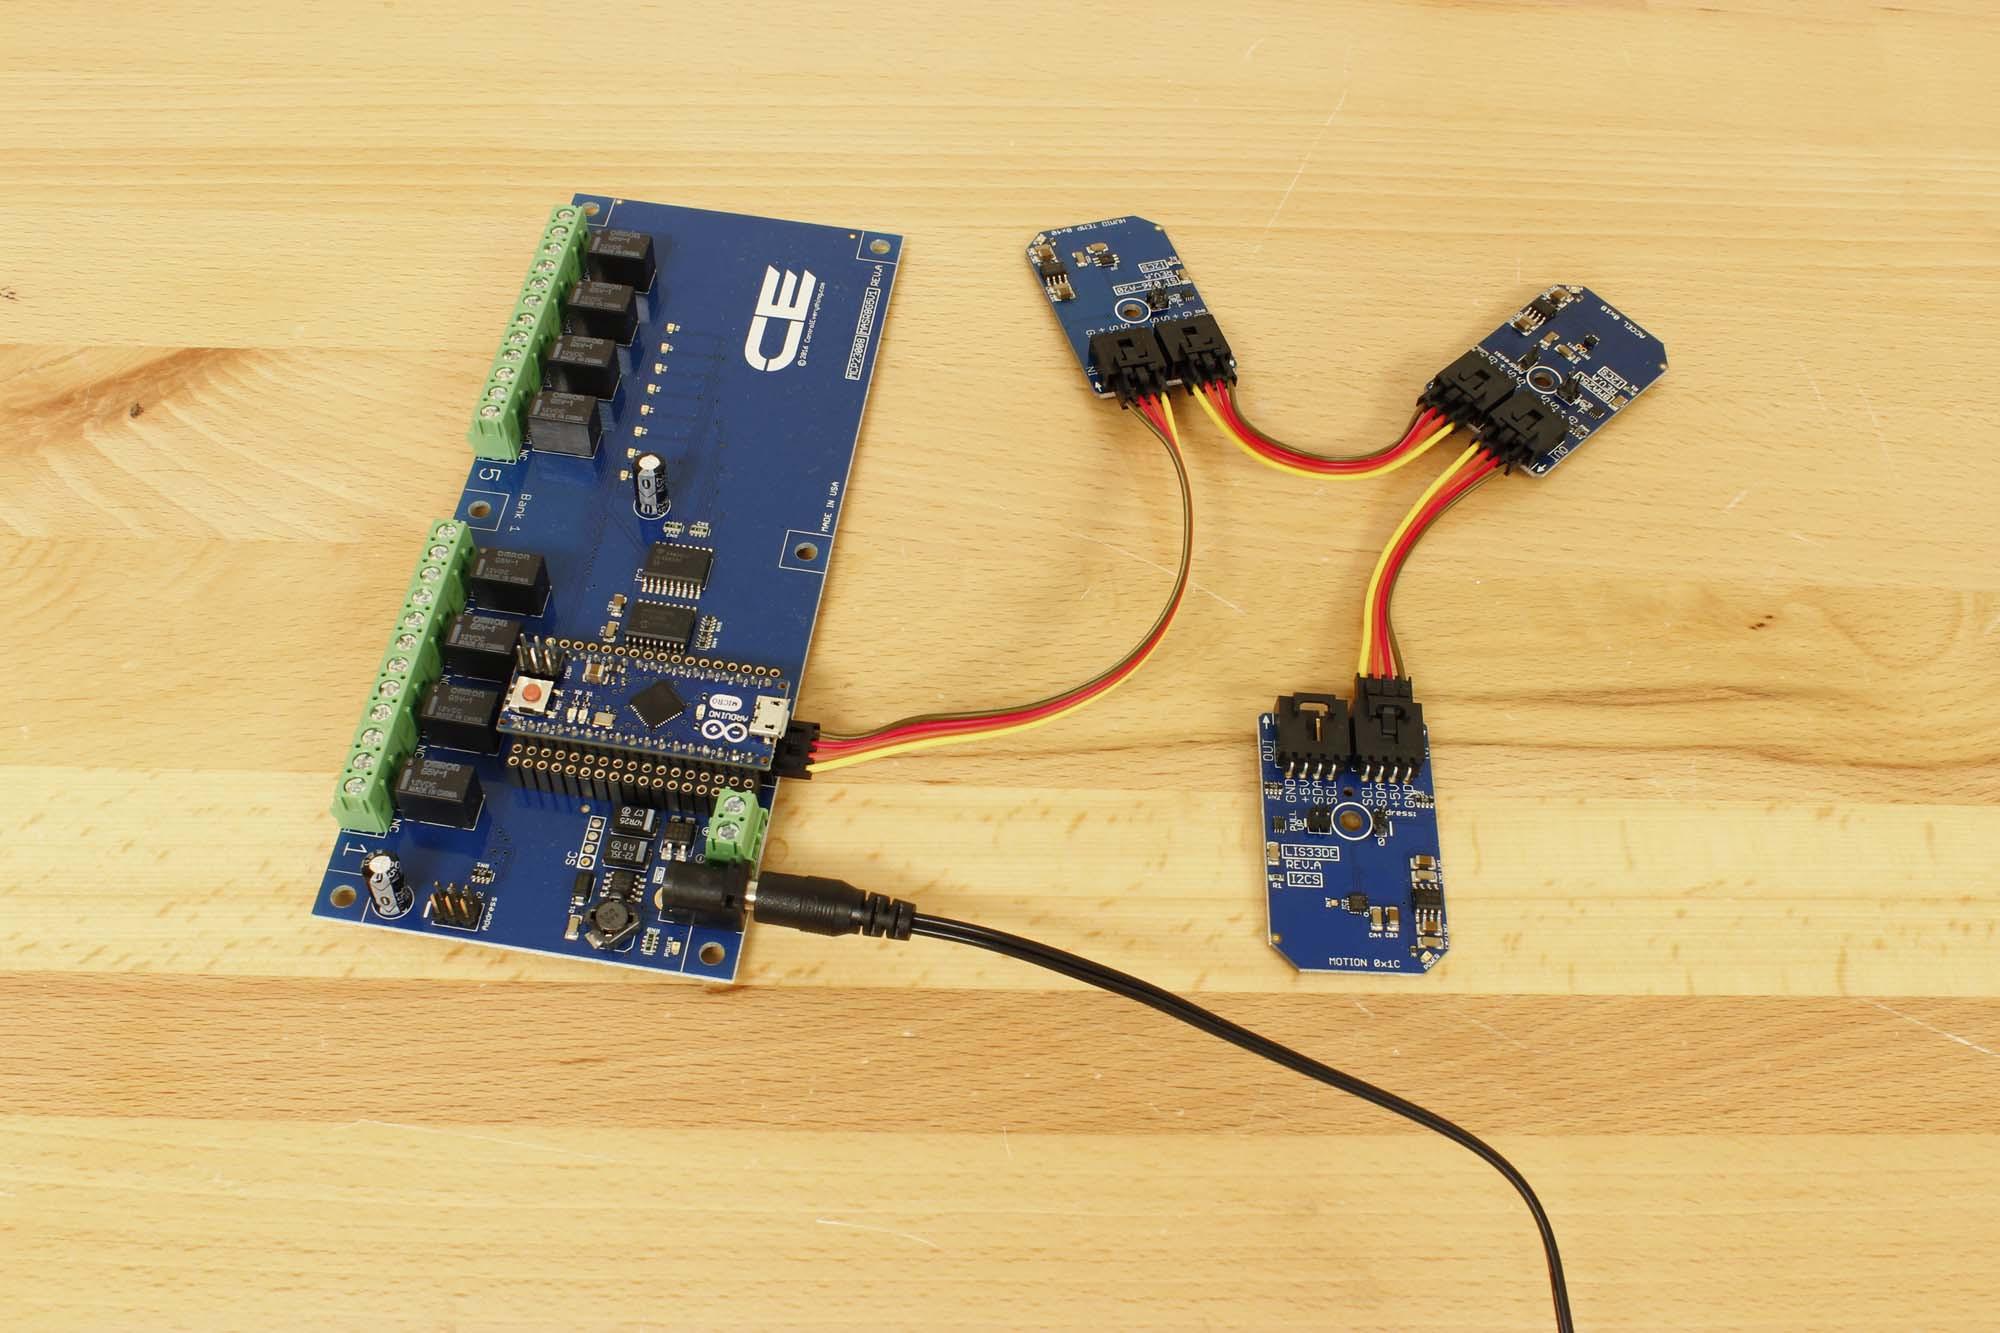 Si7006 A20 Humidity And Temperature Sensor 5rh 1c I2c Mini Electronic Component Circuit